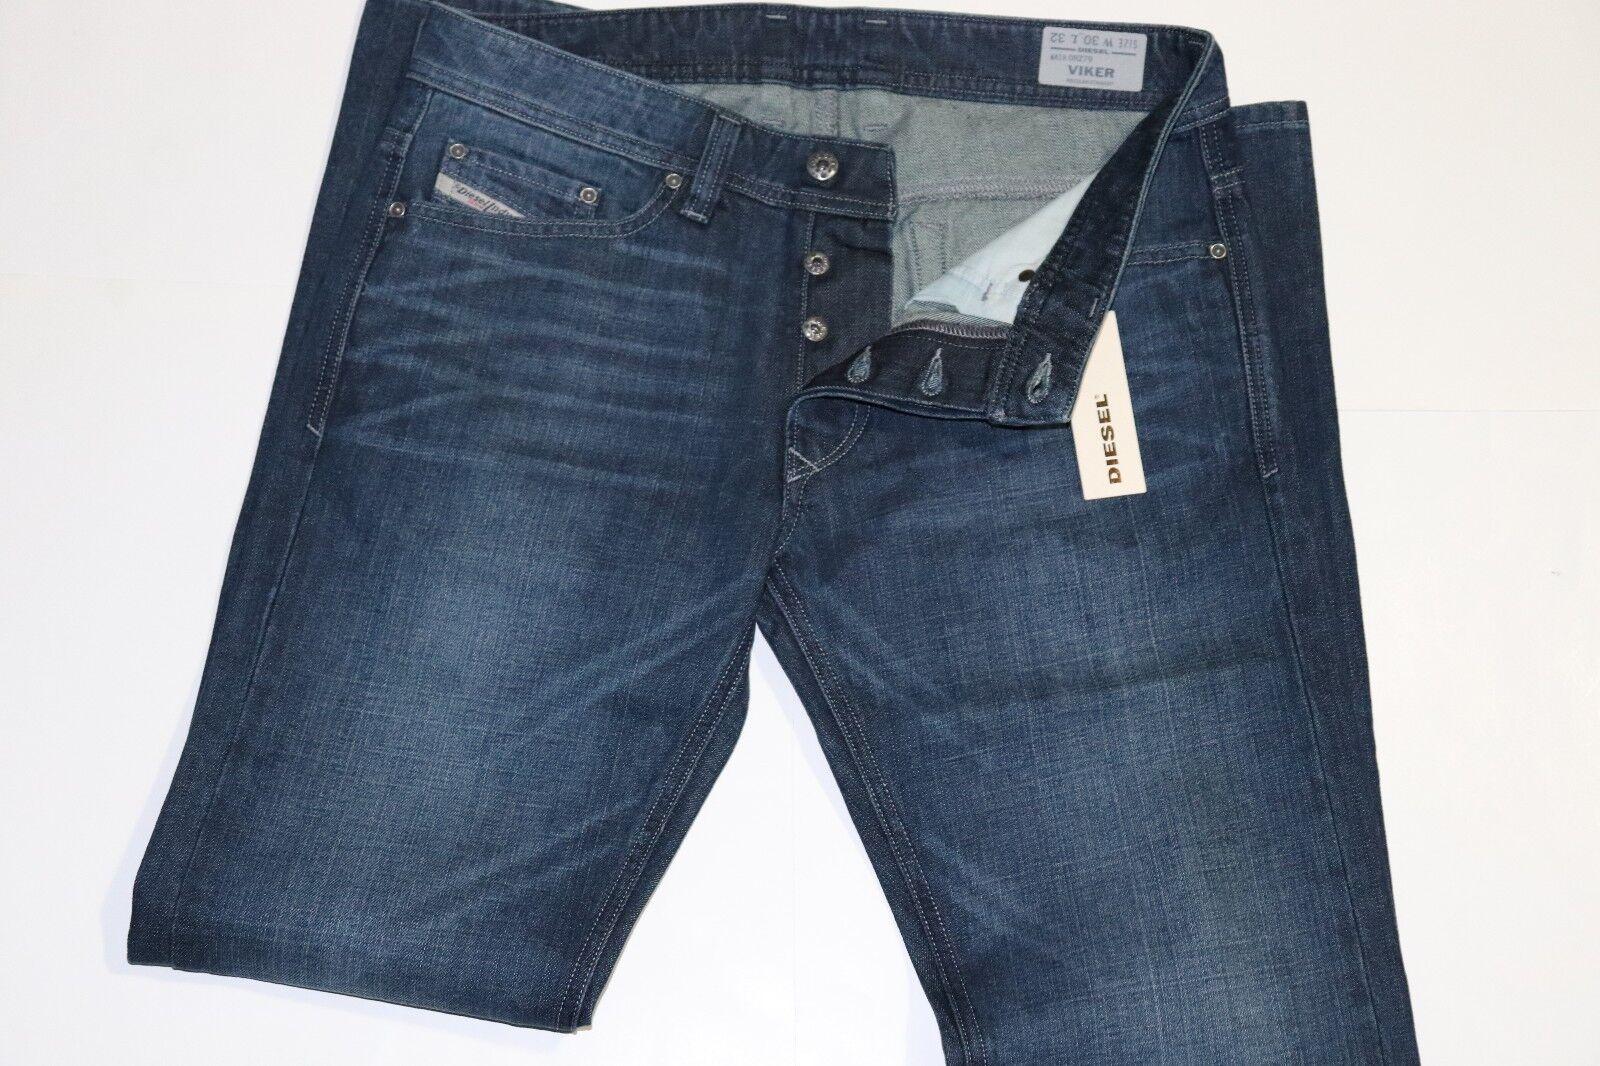 NWT  Diesel Mens VIKER Regular Straight Jeans size 30 x 32  Wash ORZ79